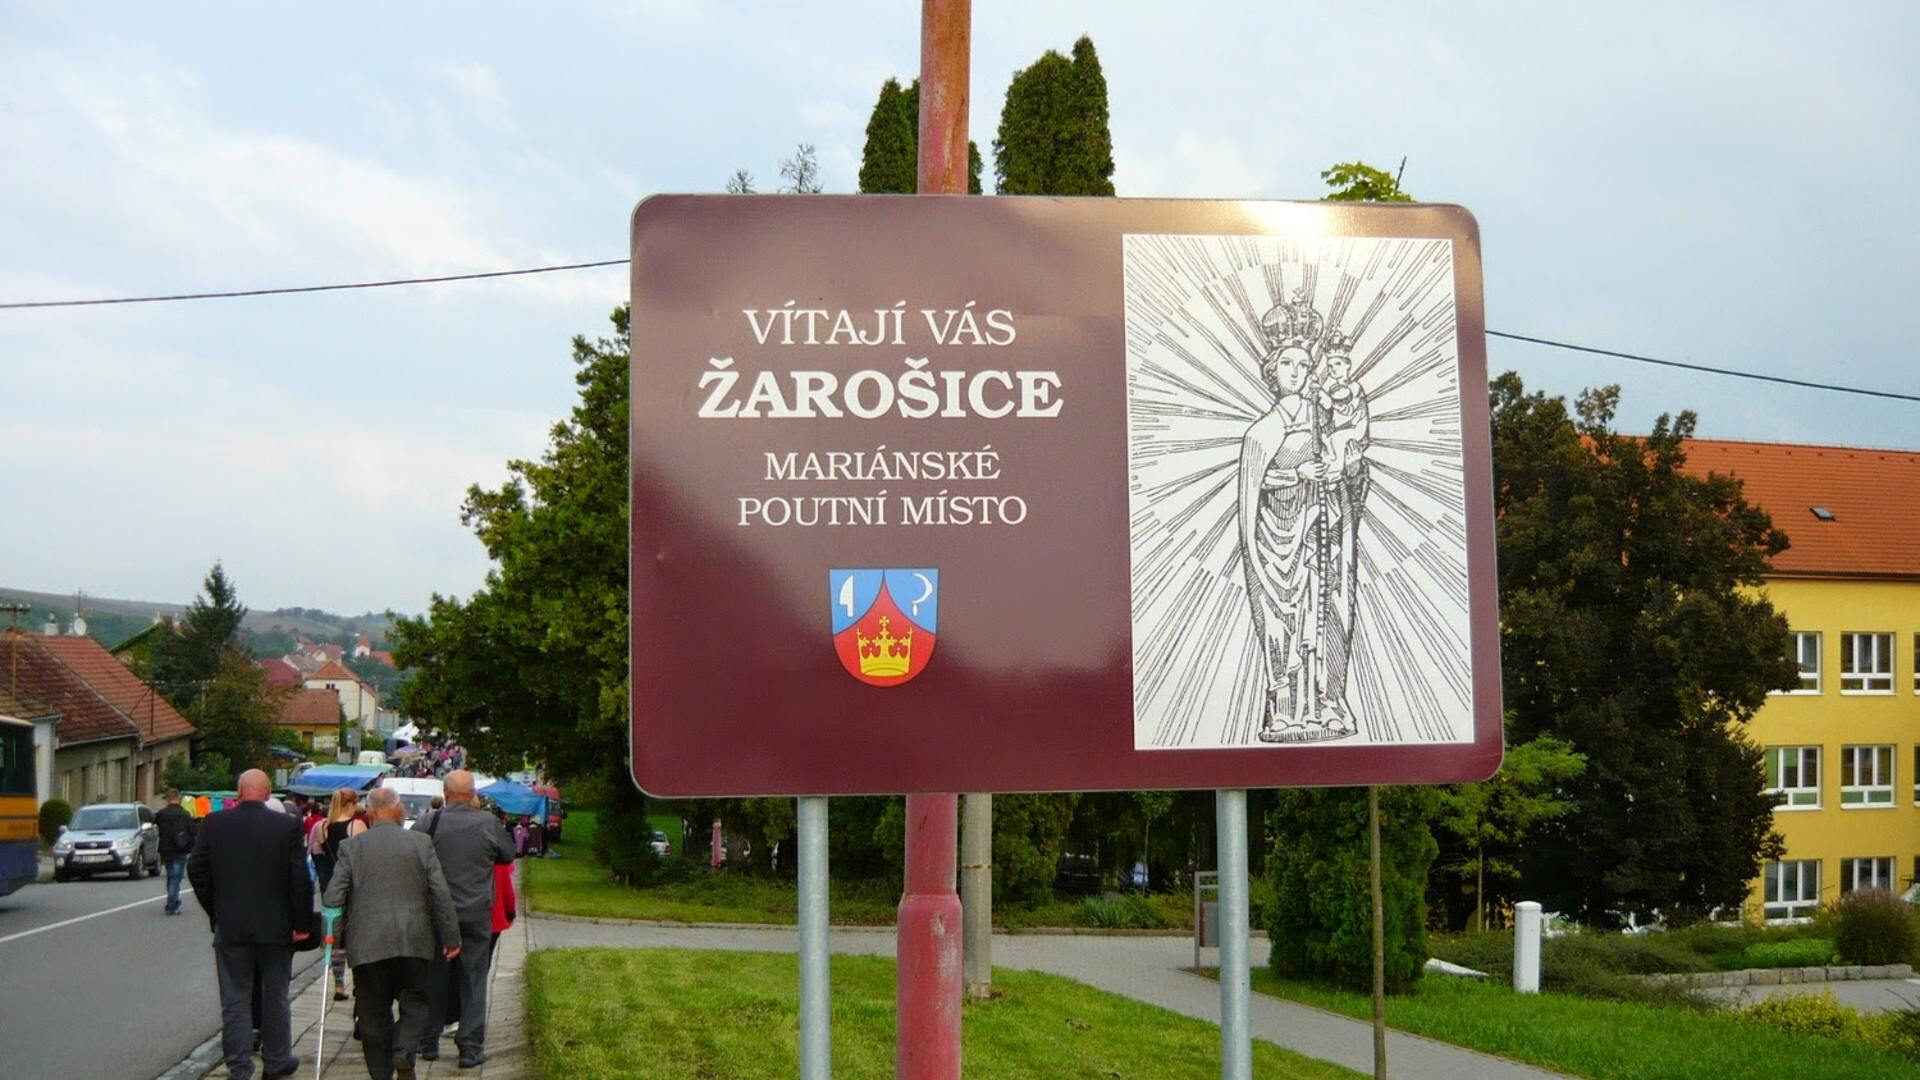 Zlatá sobota - PÚŤ ŽAROŠICE 13.9.2014